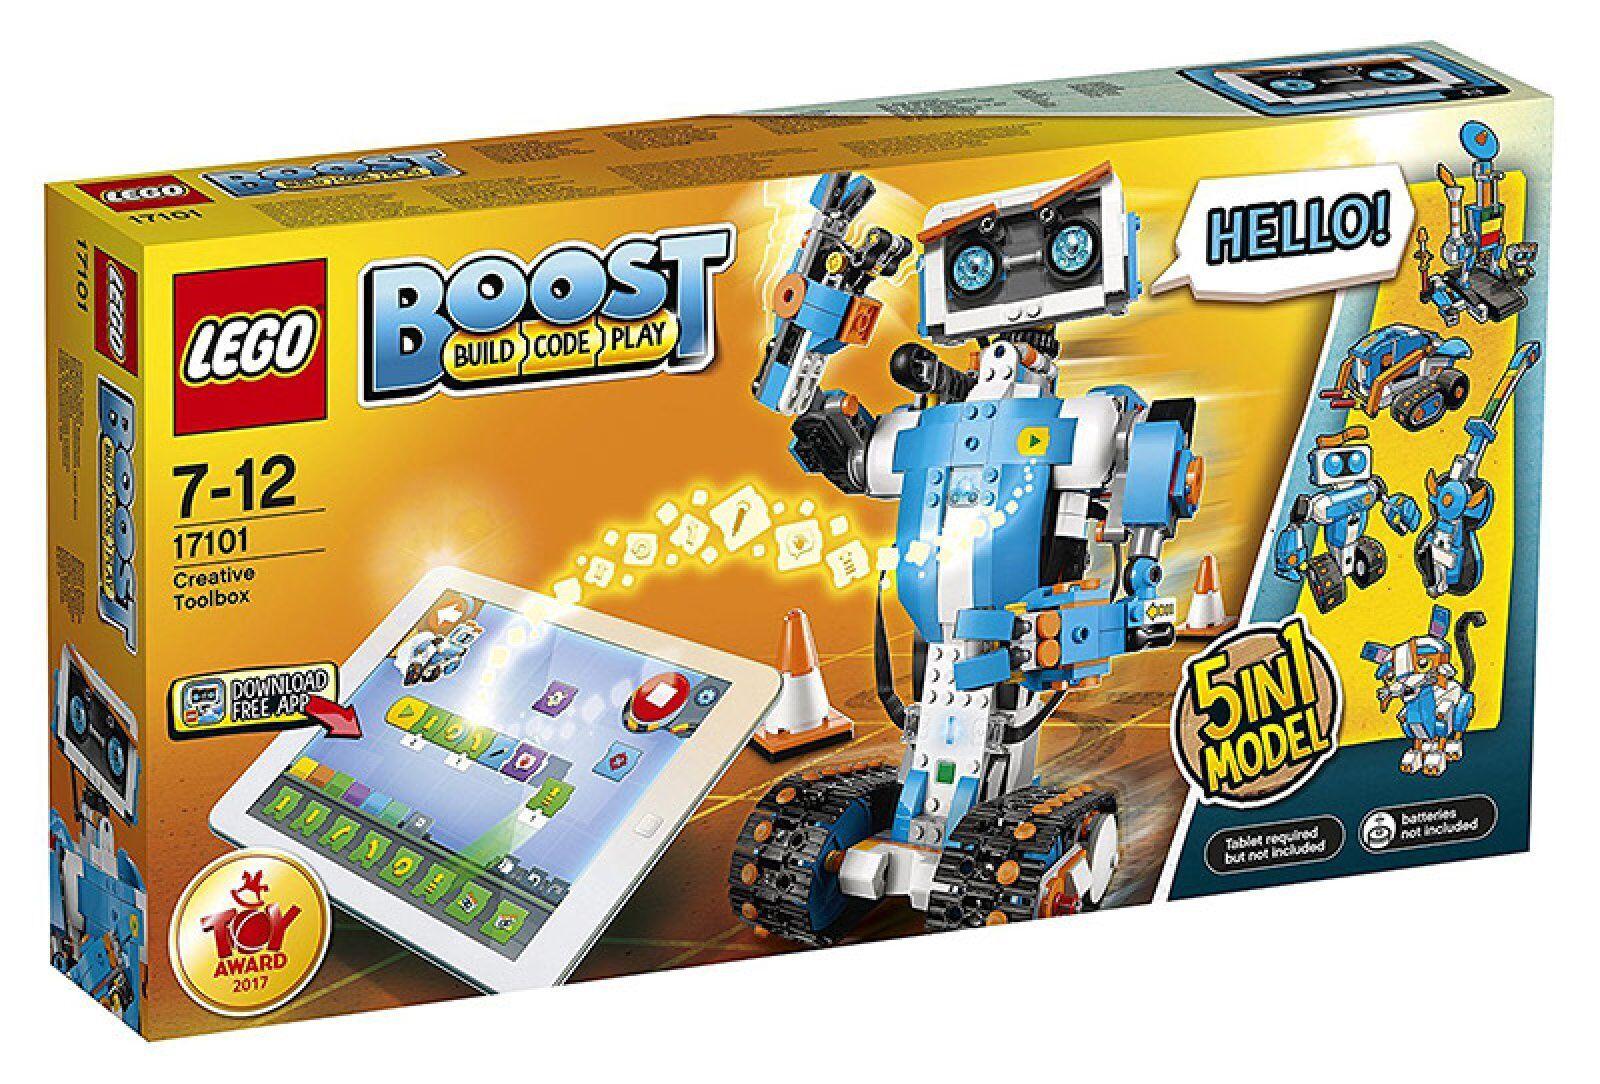 17101 LEGO Boost Toolbox Creativa